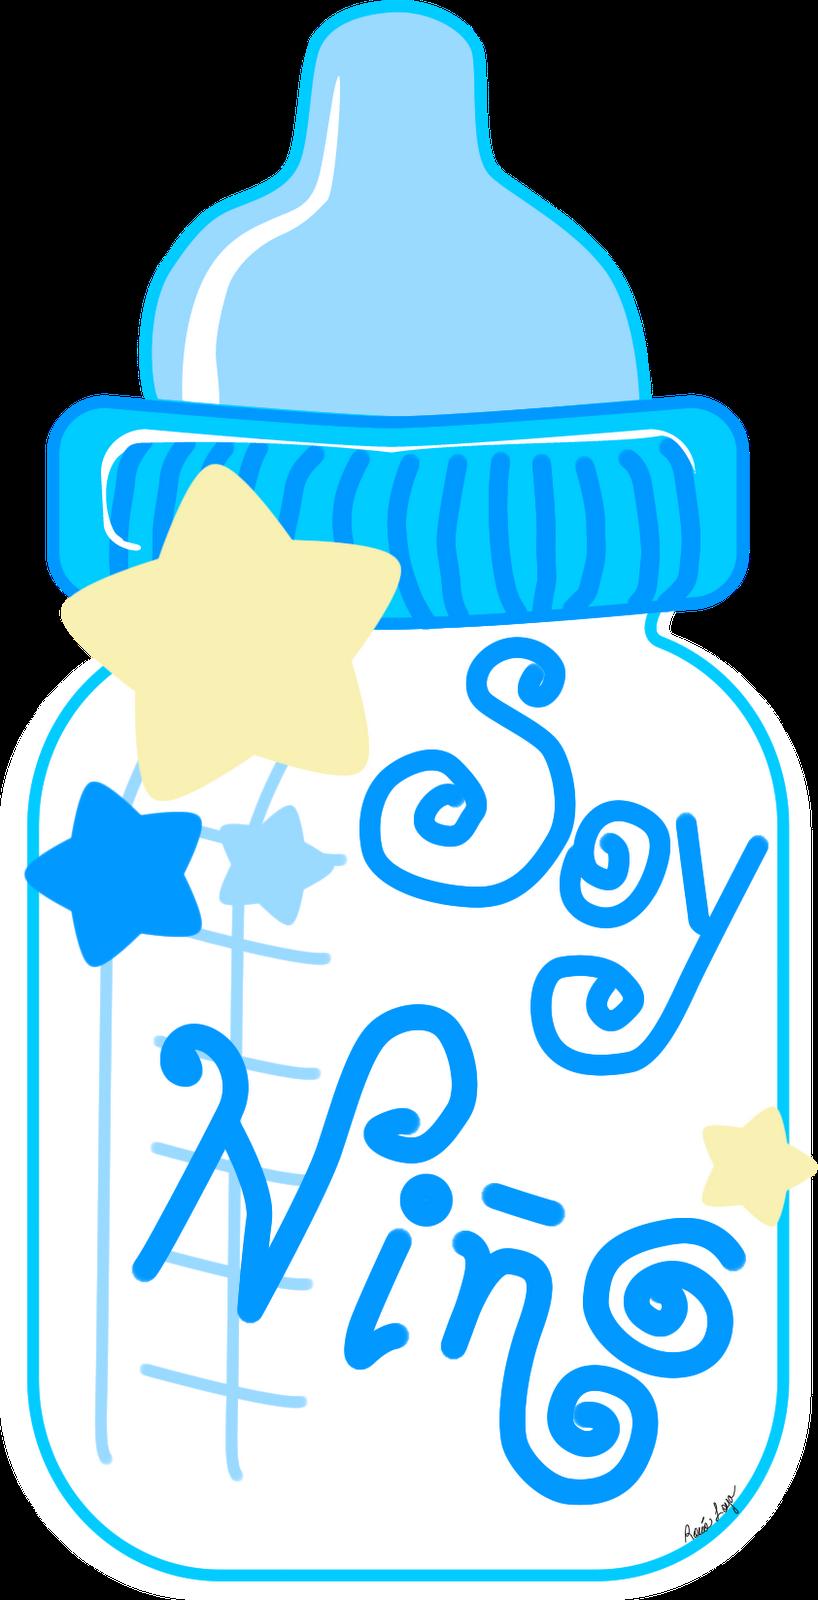 Baby Shower: Baby Shower imagenes